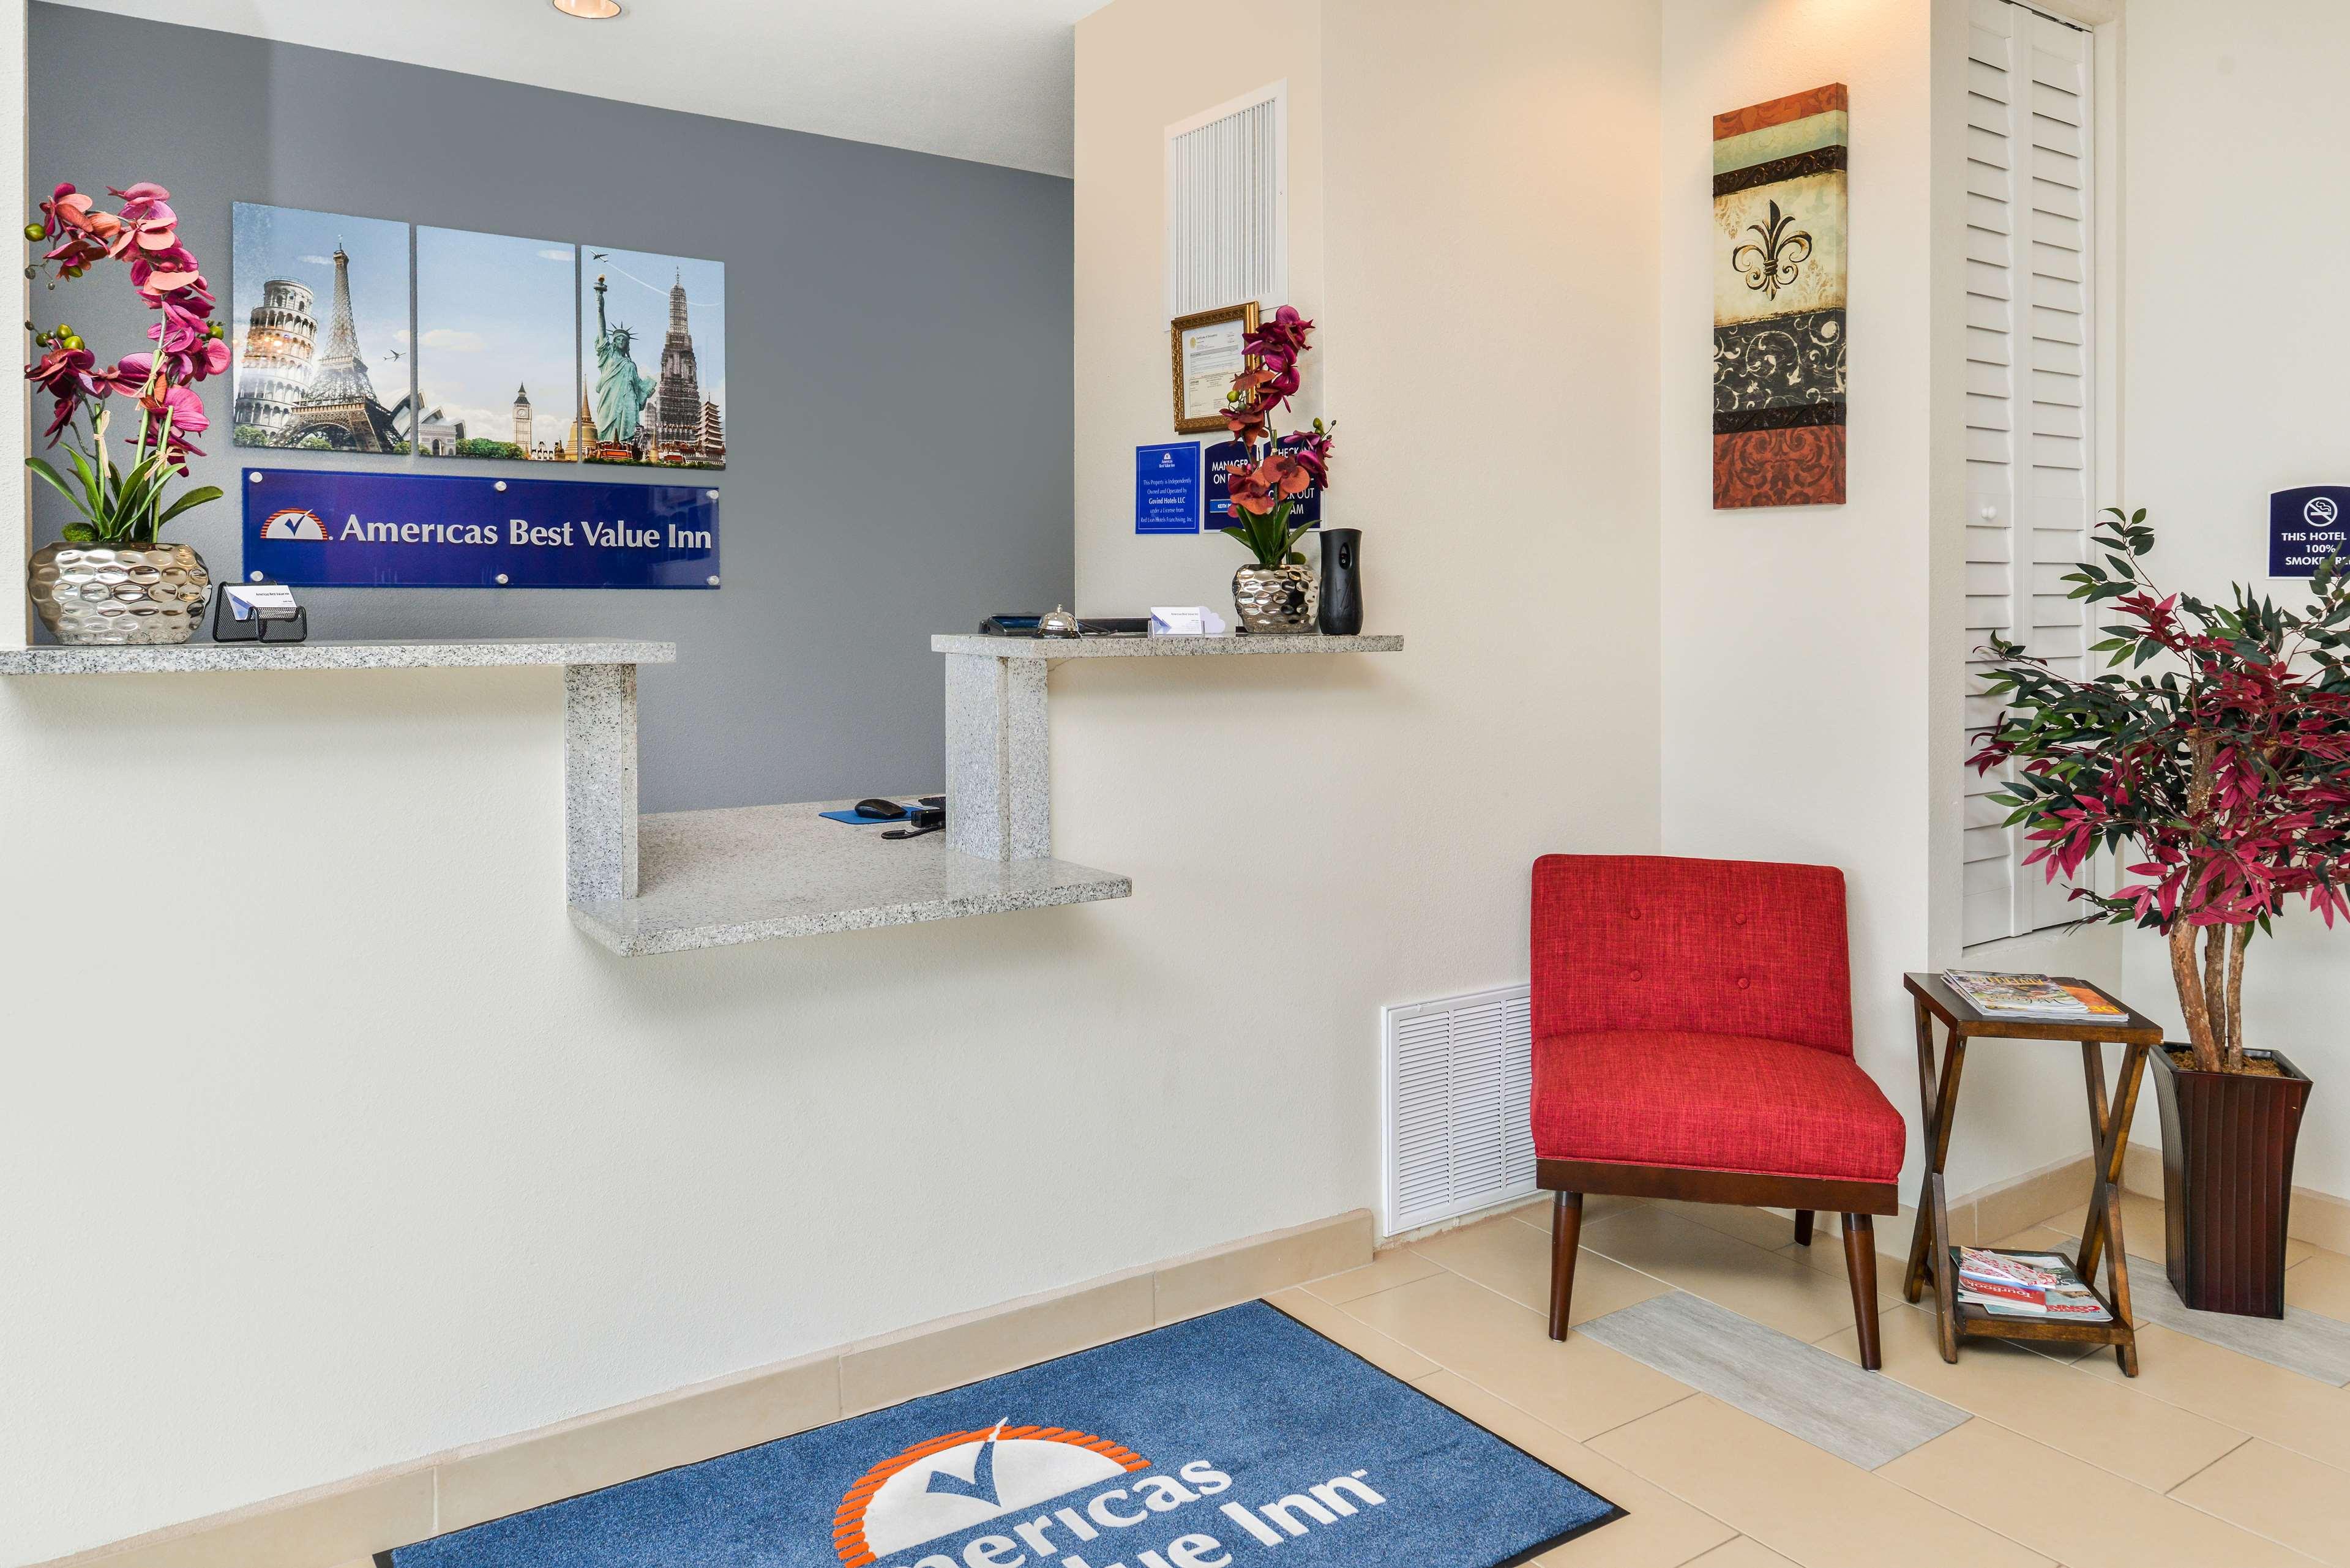 Americas Best Value Inn - Baton Rouge / College Drive image 3